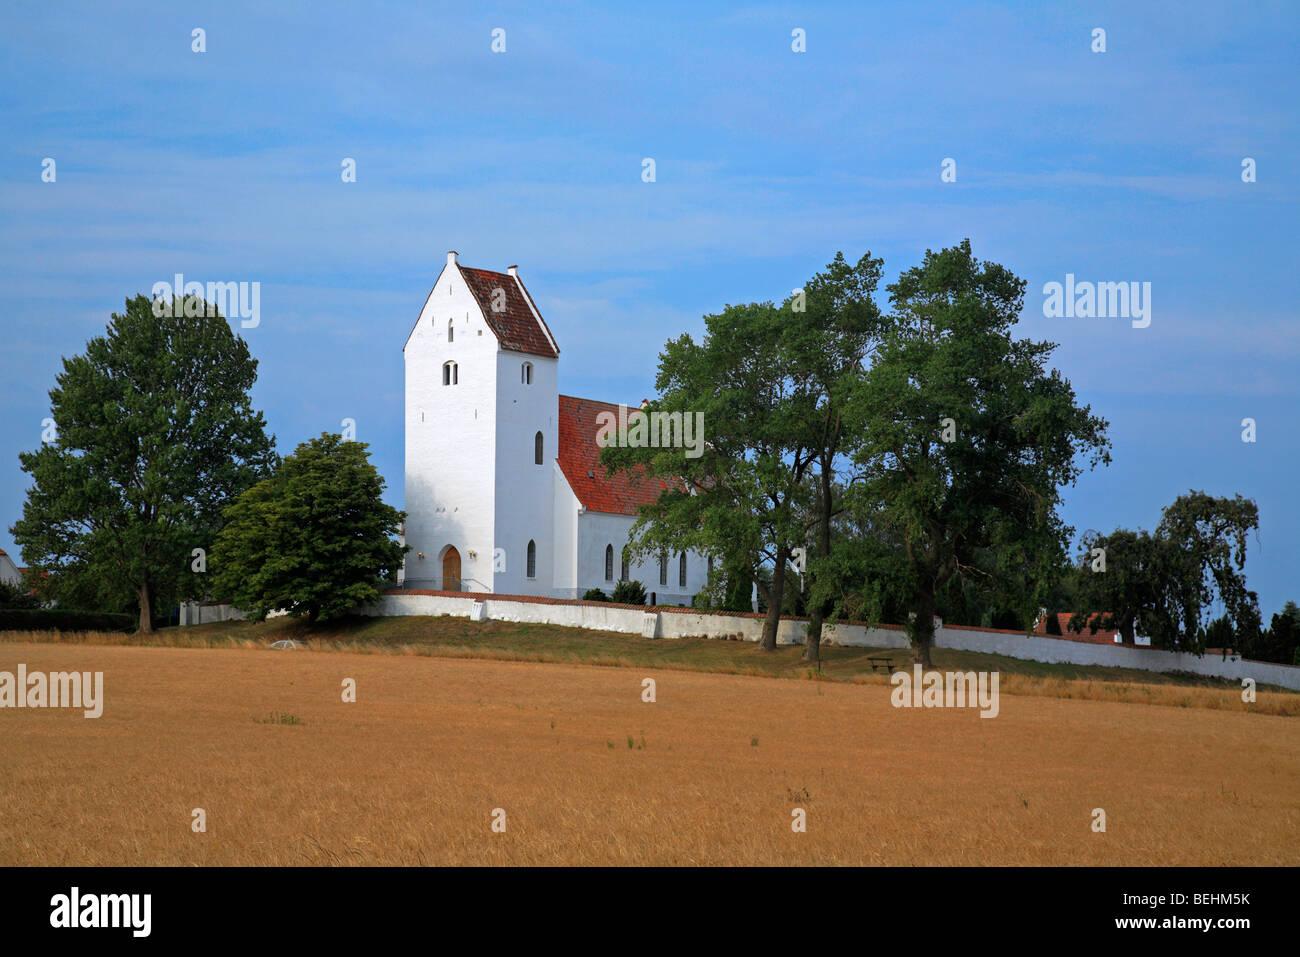 Kalvehave church, Sjaelland, Denmark - Stock Image